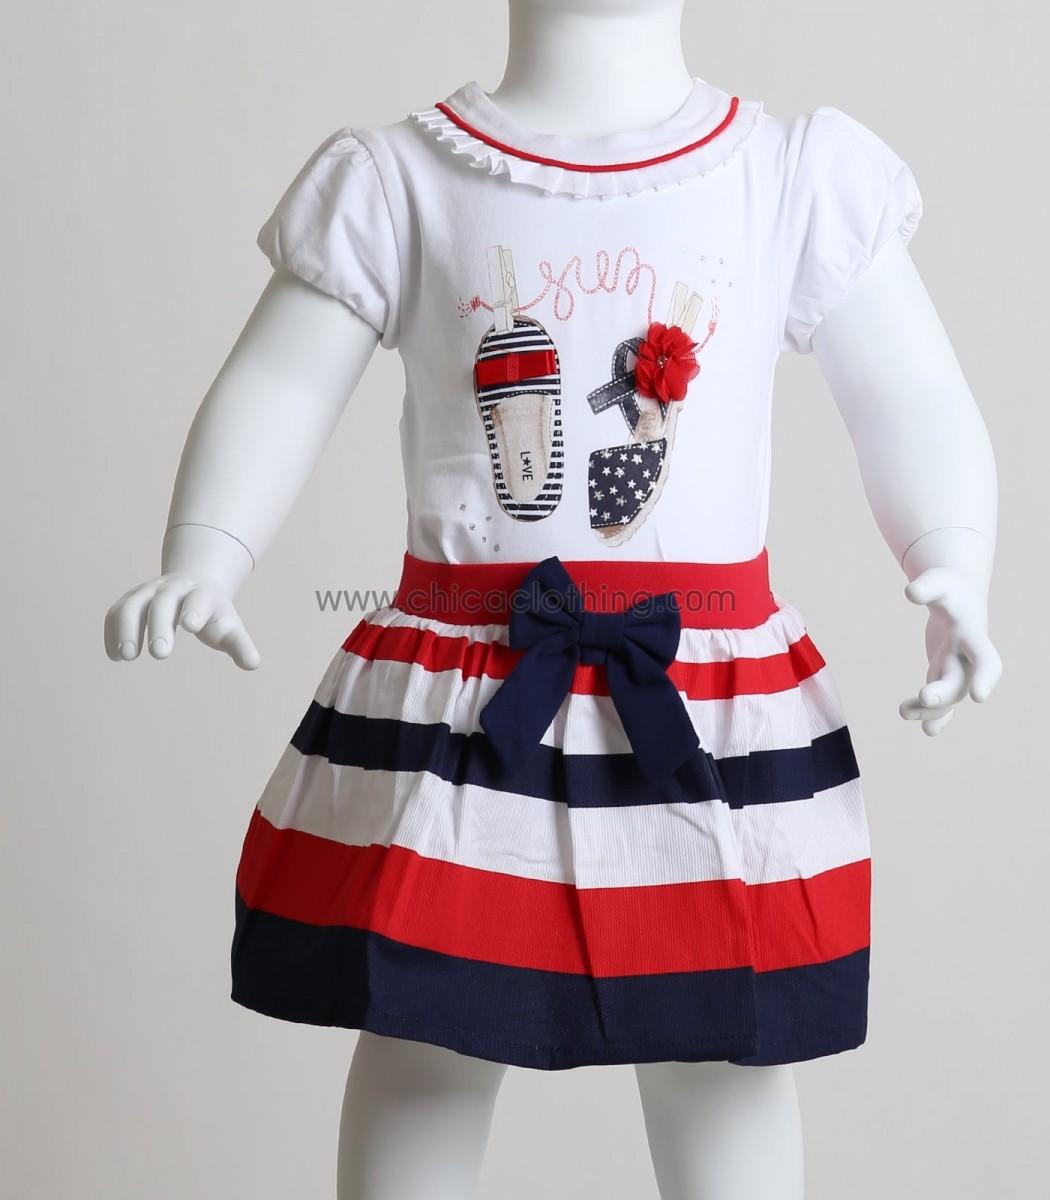 9a19dfcbfdc1 Βρεφικό σετ μπλούζα - φούστα με σχέδιο παπουτσάκια (Λευκό)